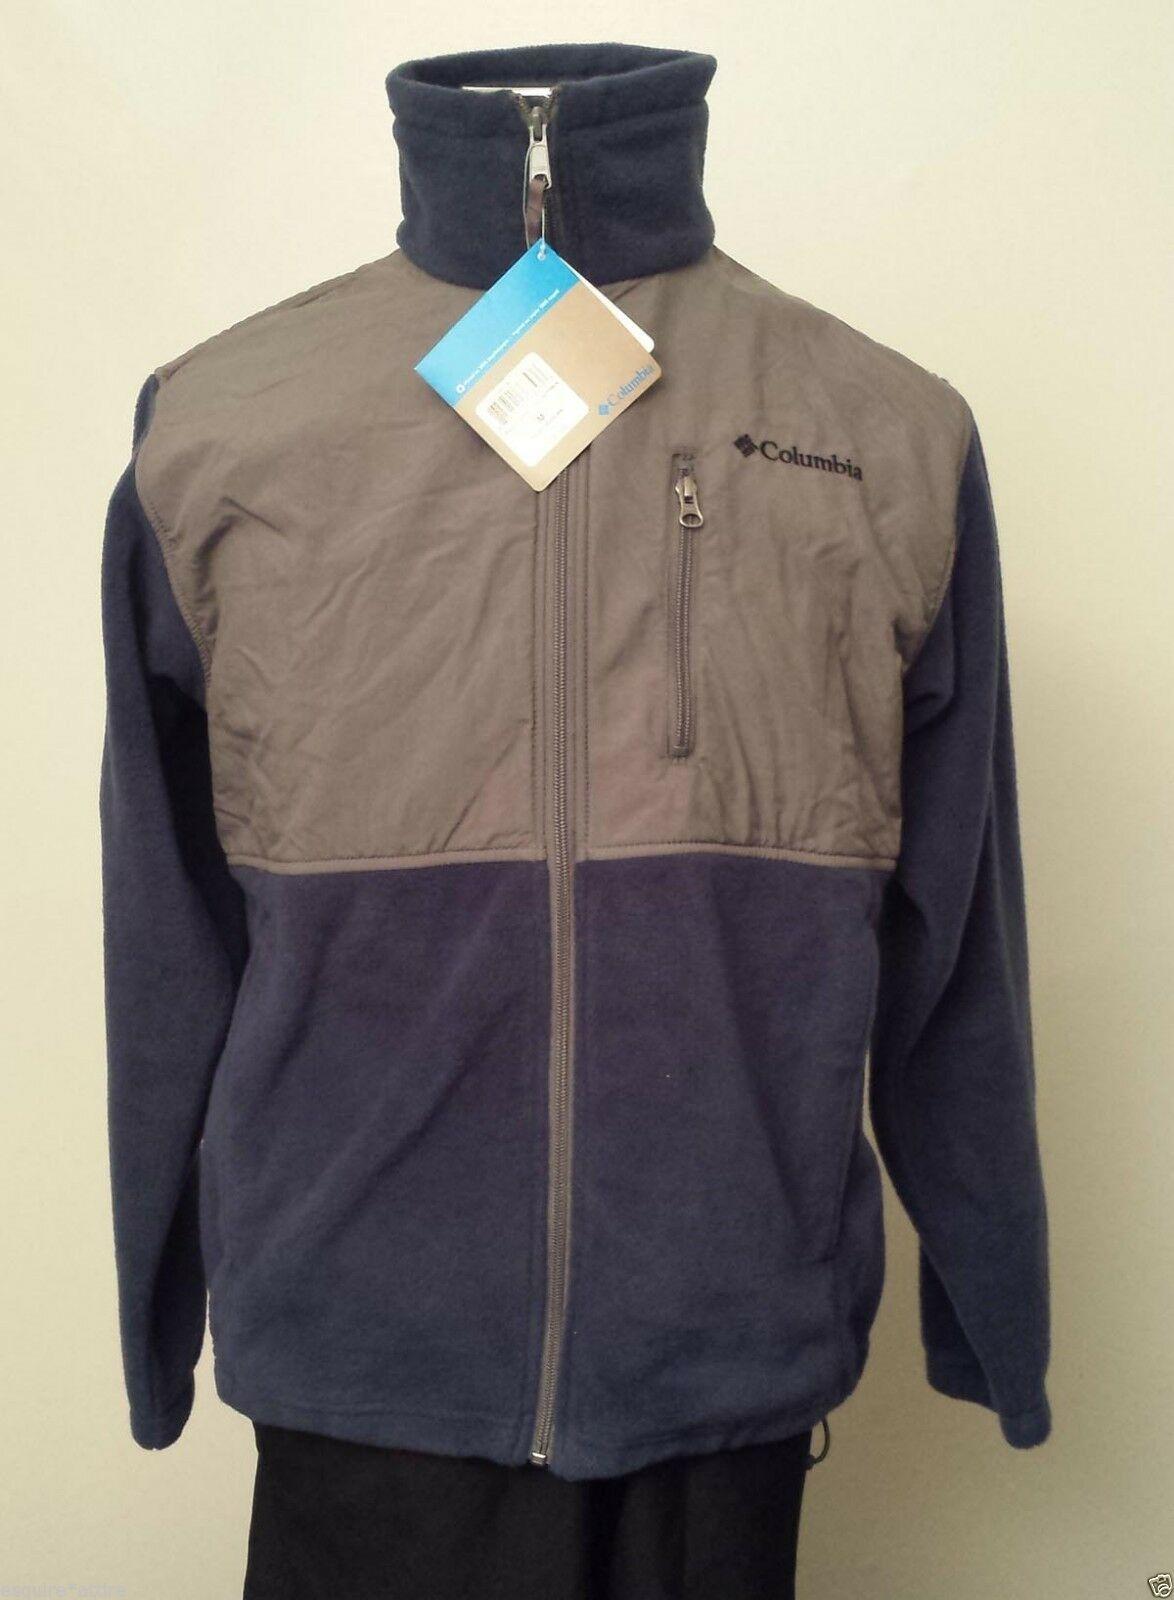 Nautica  Olive Vine 1//4 Zip Fleece Jacket Top Mens Medium M NWT $80